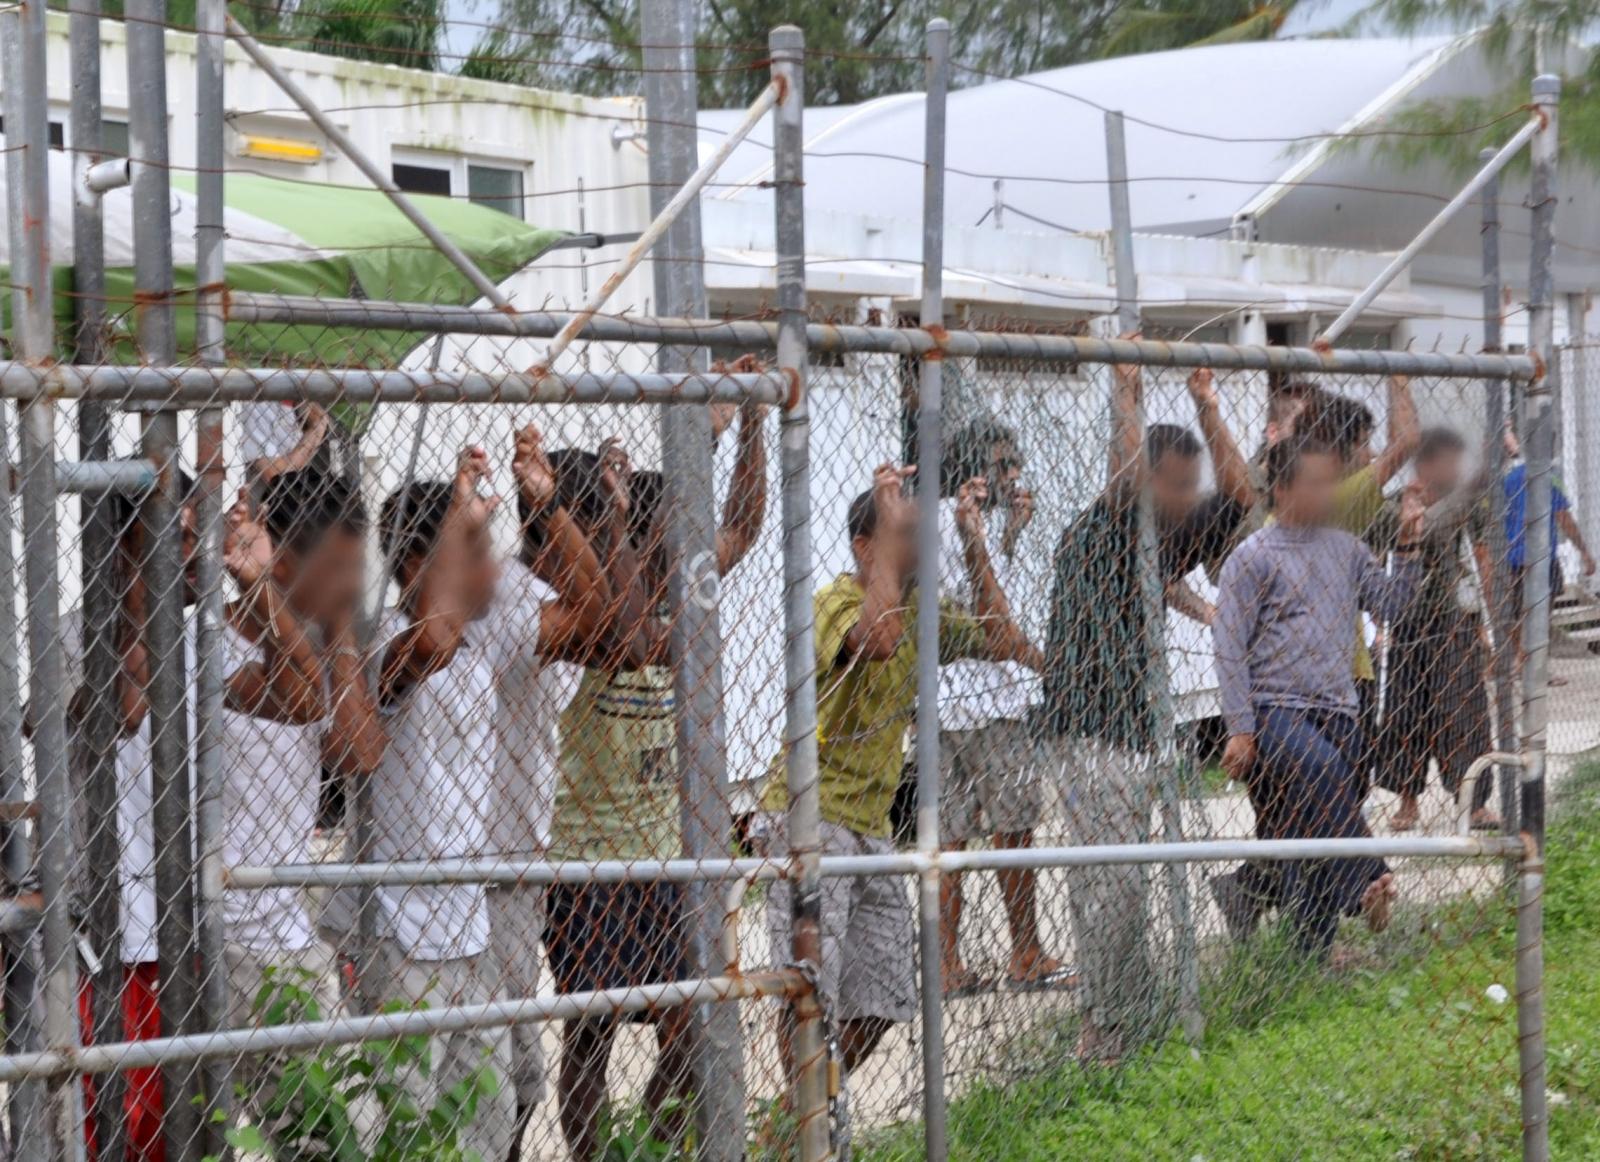 Australia immigration camps